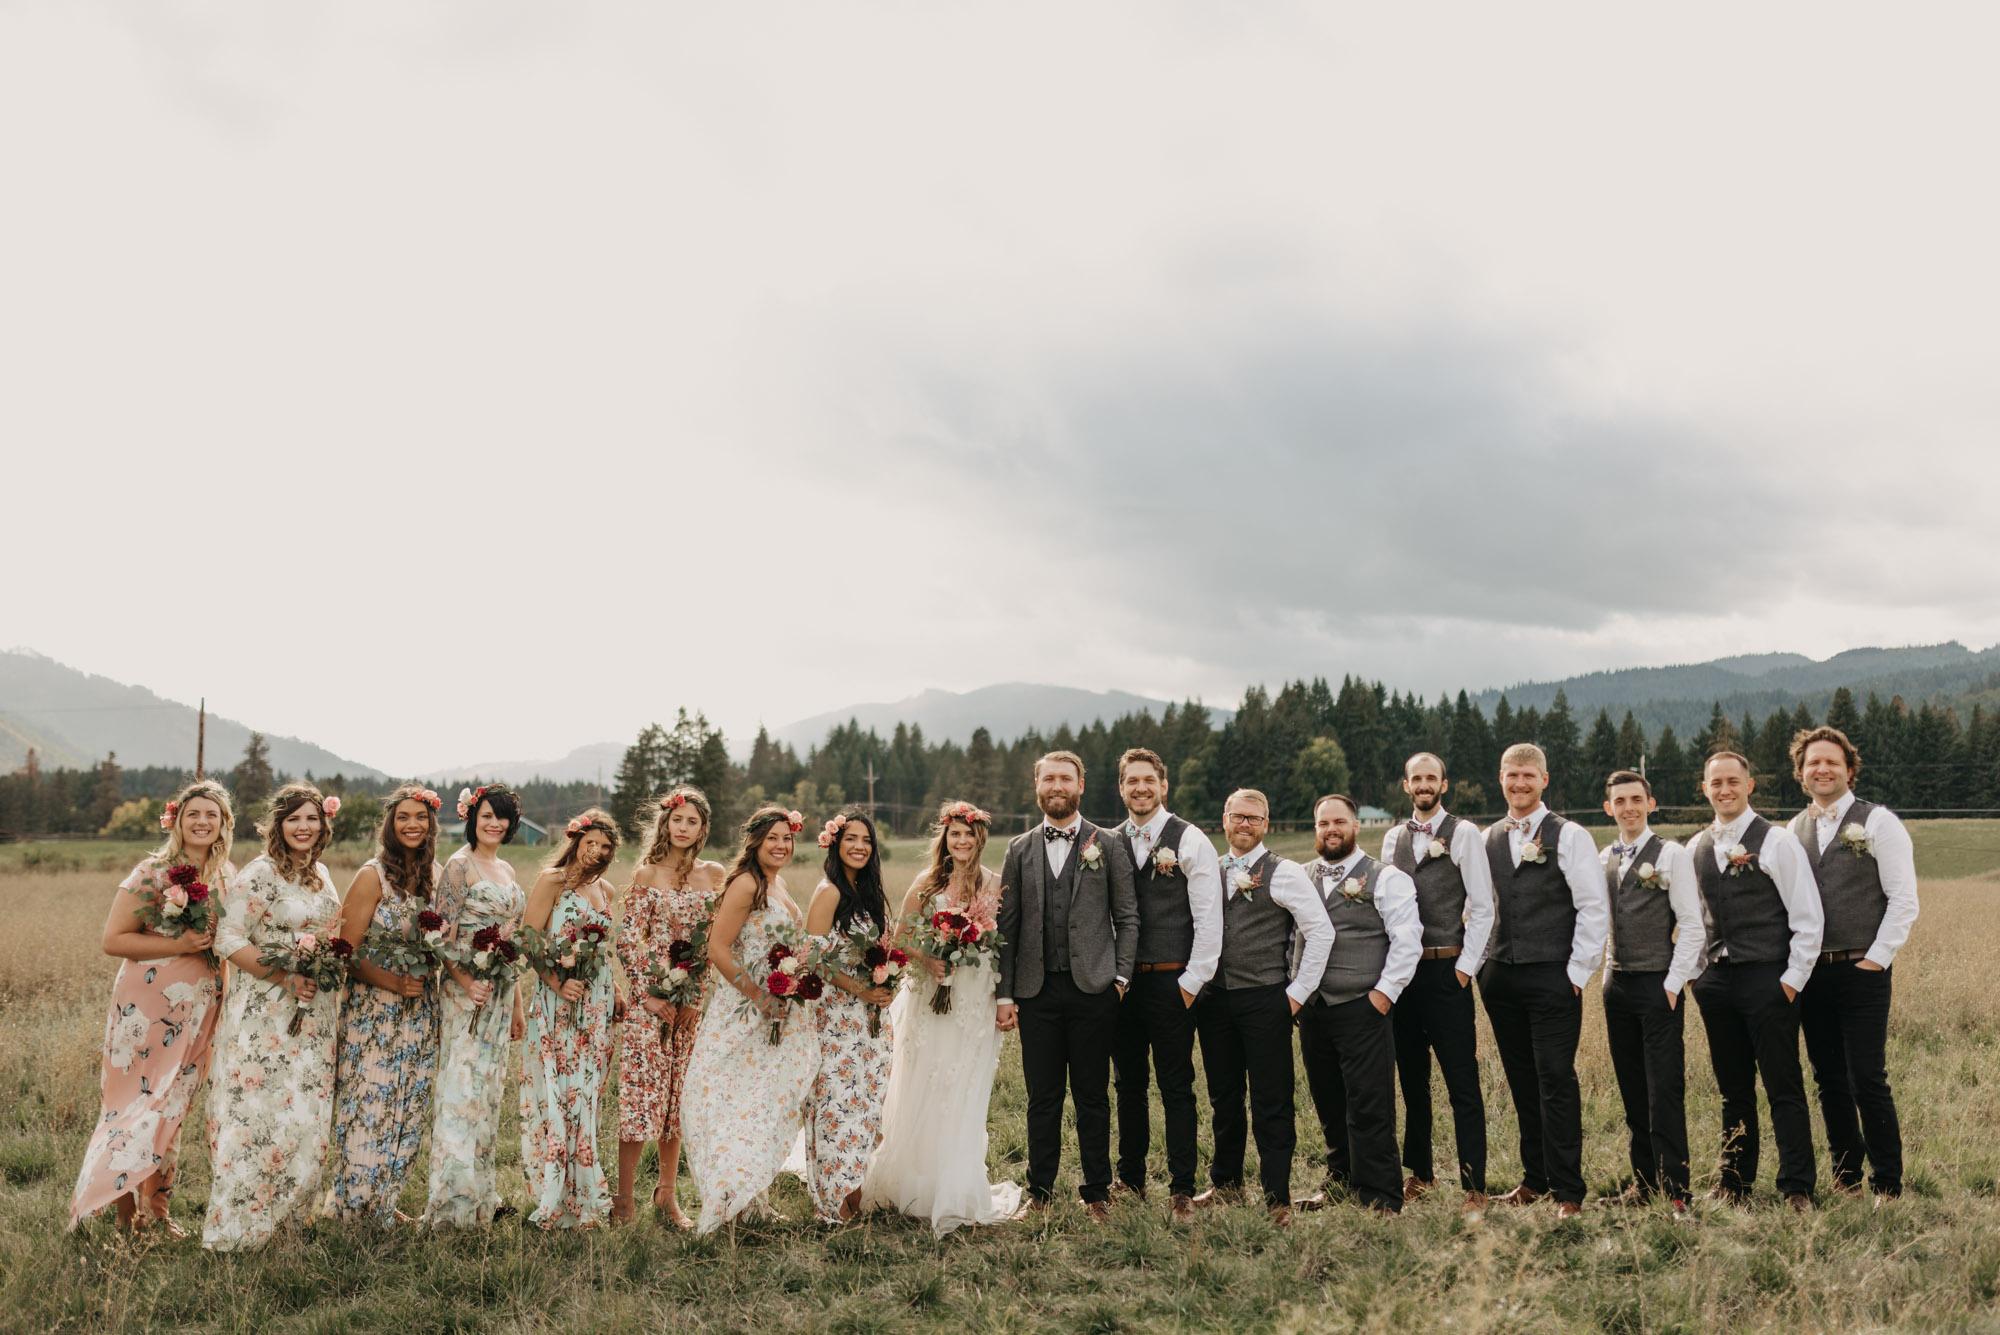 Bridal-Party-Free-People-Flower-Dresses-Washington-Wedding-8652.jpg